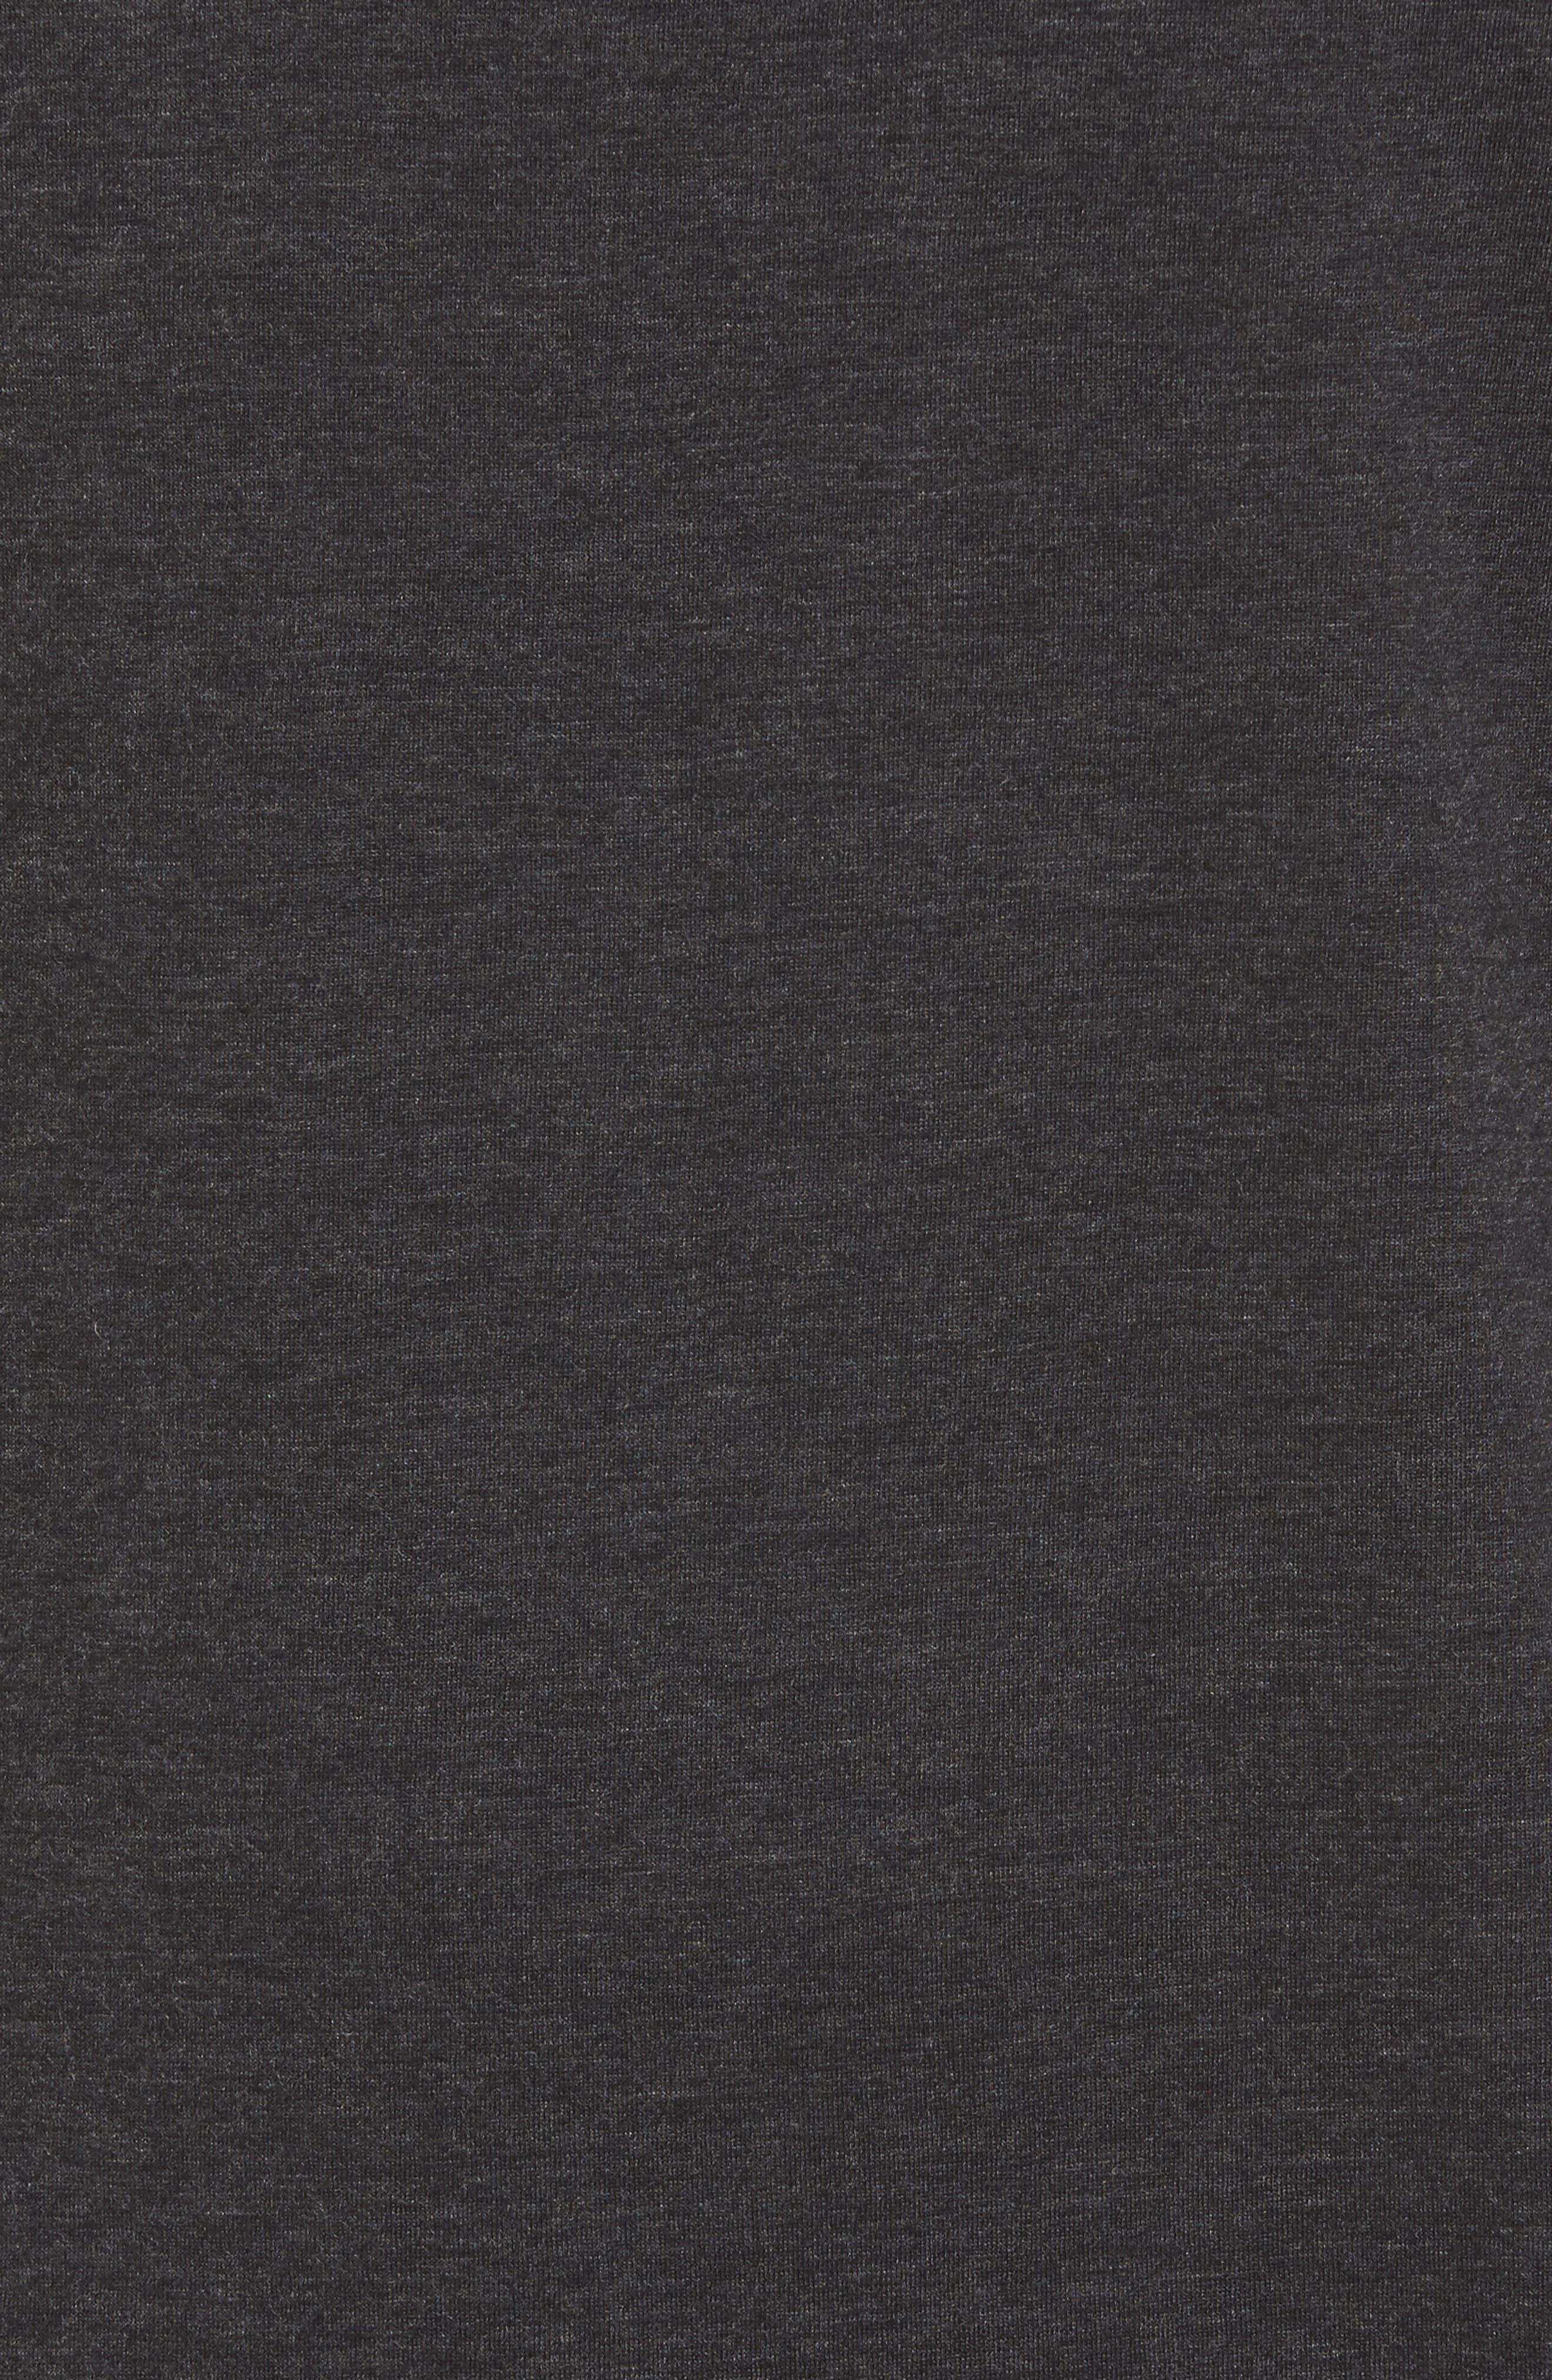 ALO, The Triumph Sleeveless T-Shirt, Alternate thumbnail 5, color, CHARCOAL BLACK TRIBLEND